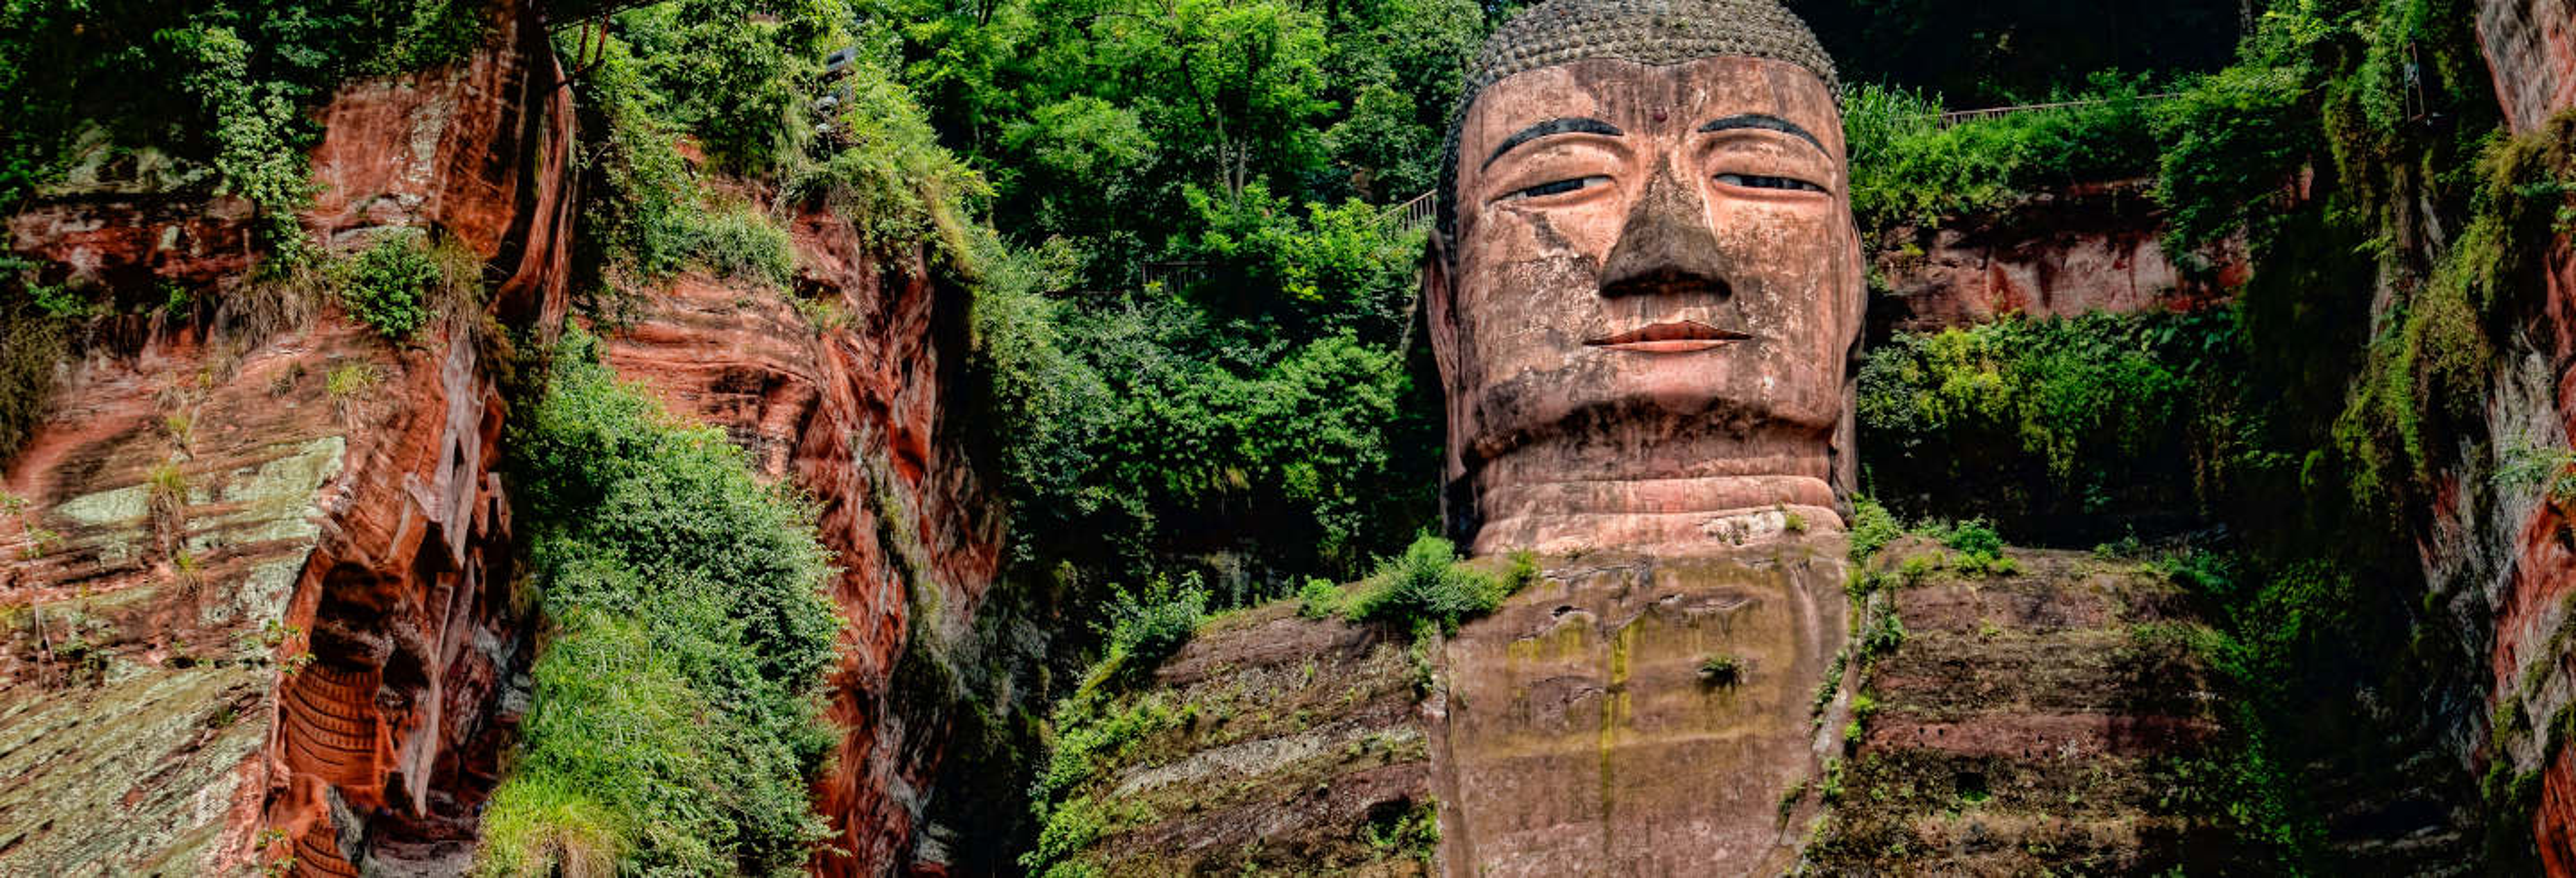 Grande Buda de Leshan + Reserva de pandas